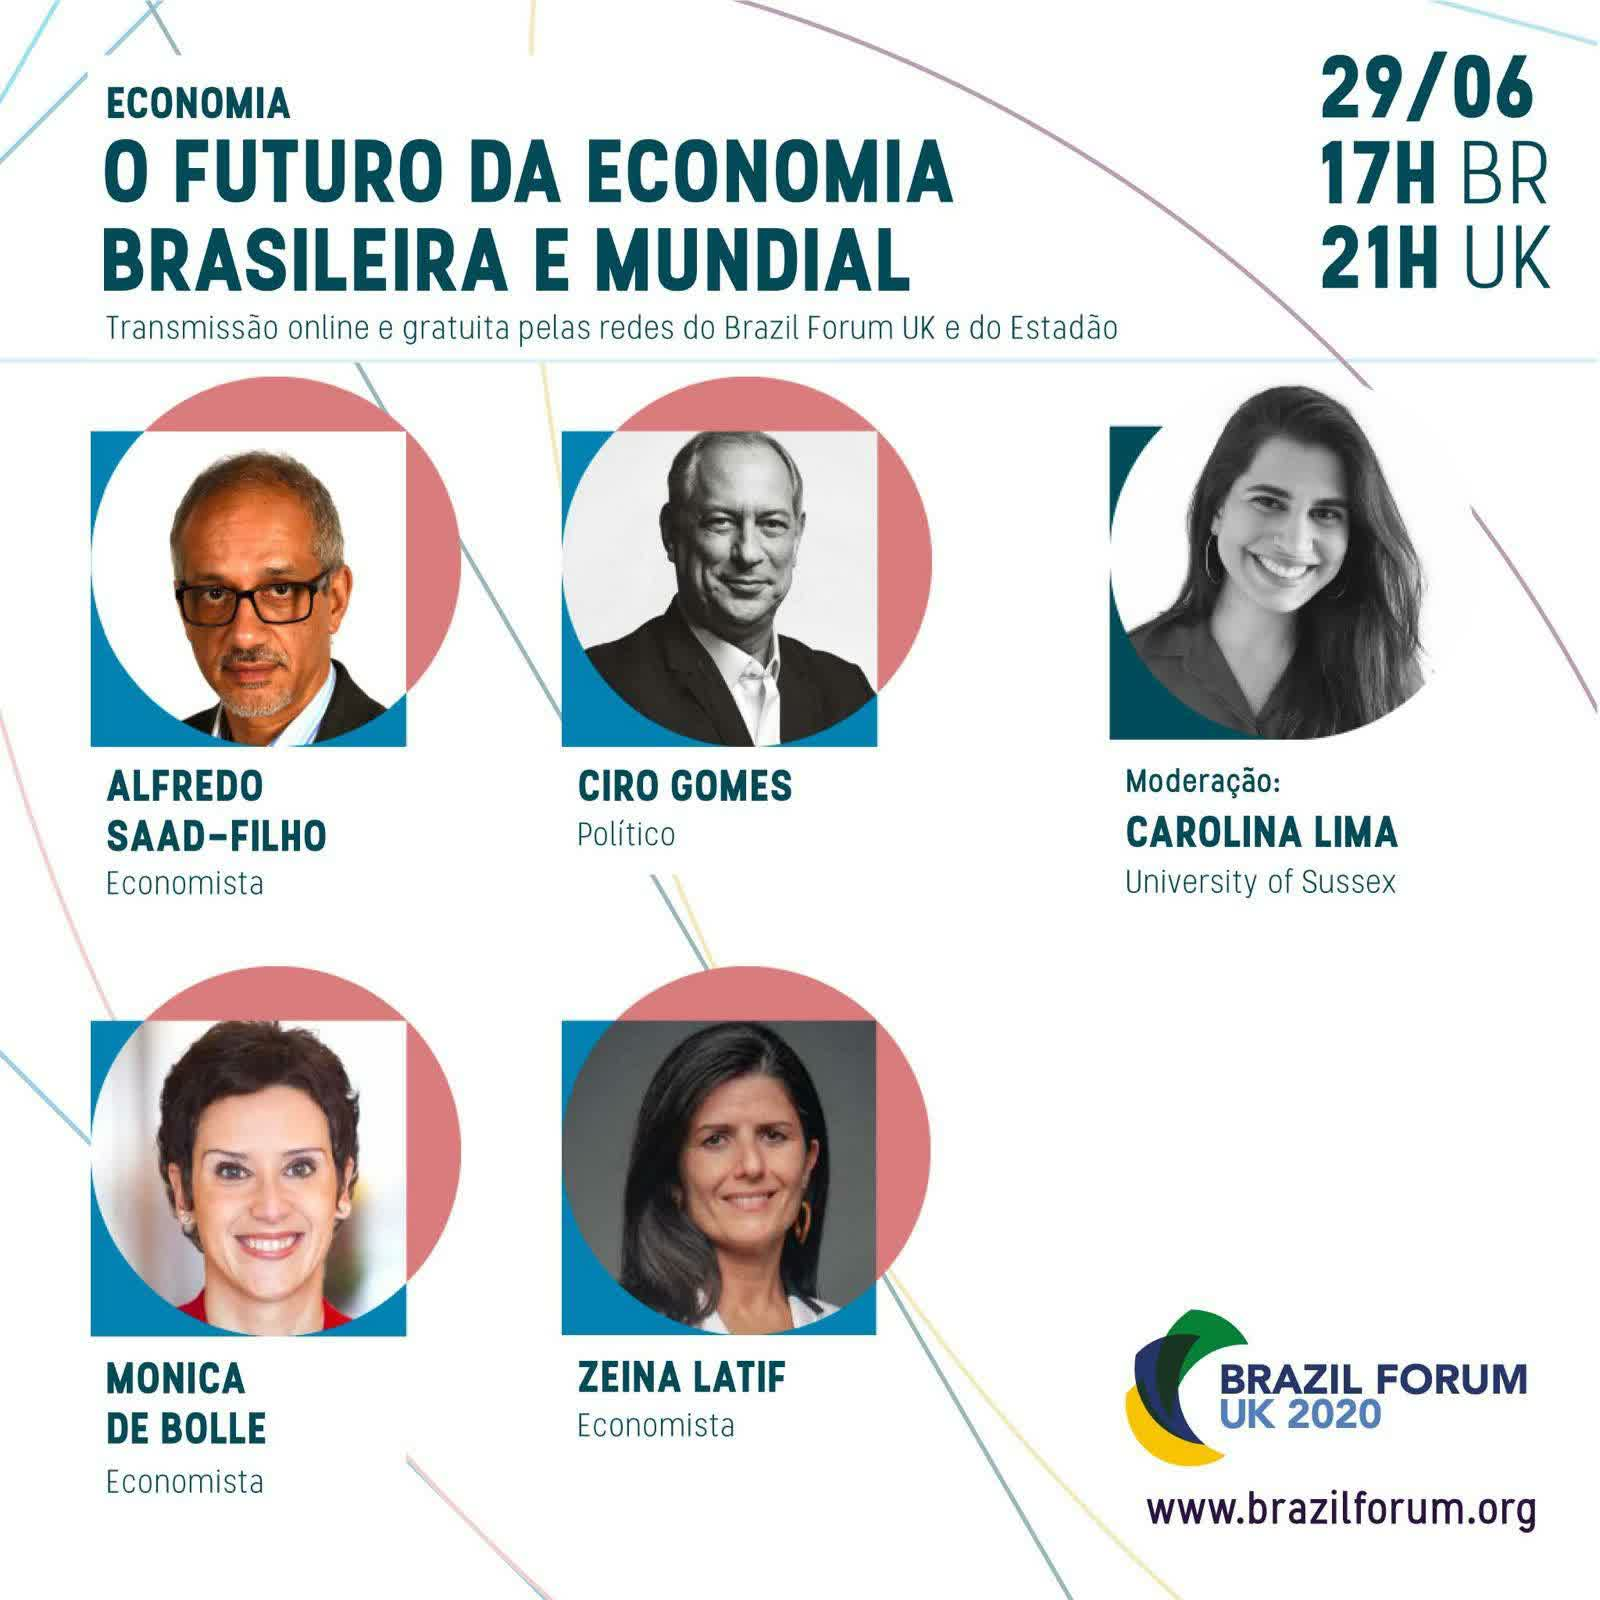 29/06/2020   Ciro Gomes participa de debate no BRAZIL FORUM UK 2020